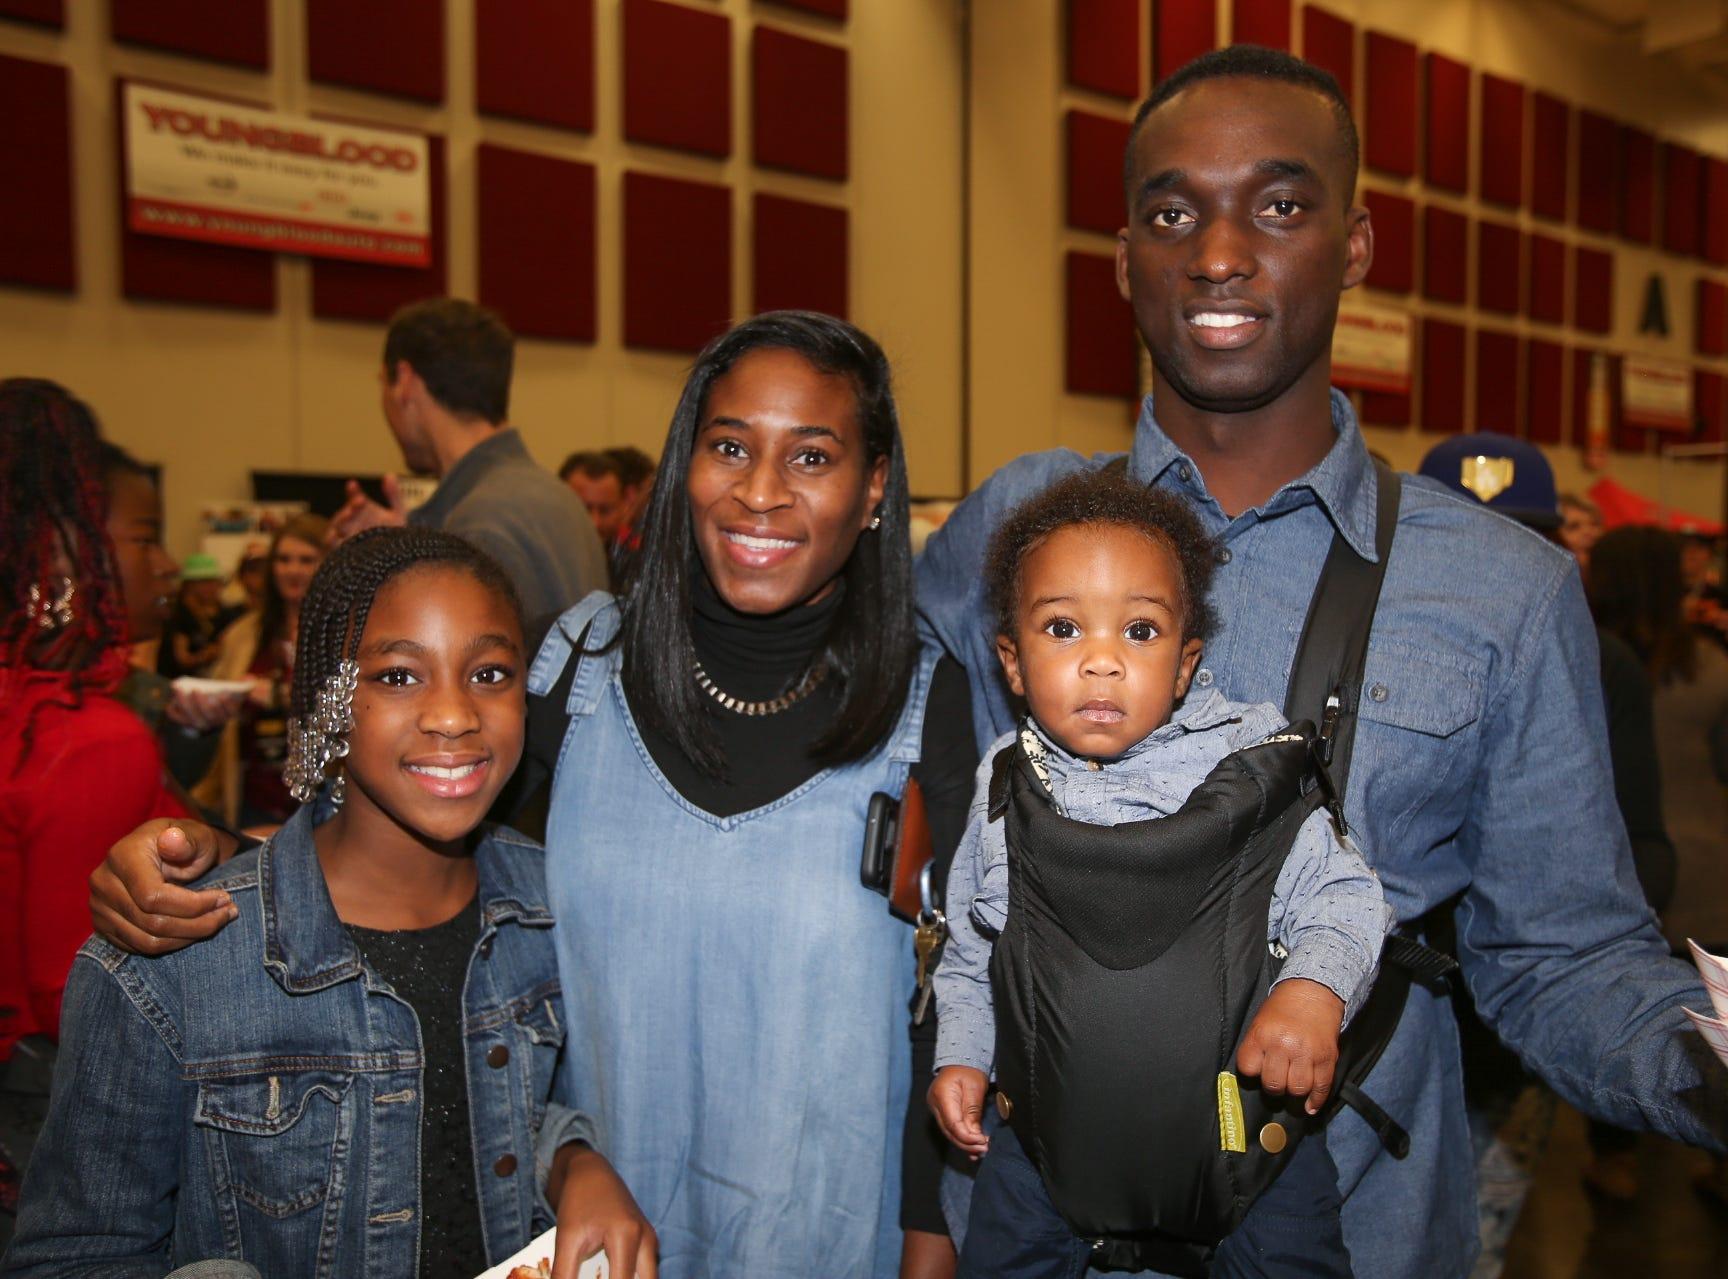 Lesley, George, Aniyah, and Jaden Mensah